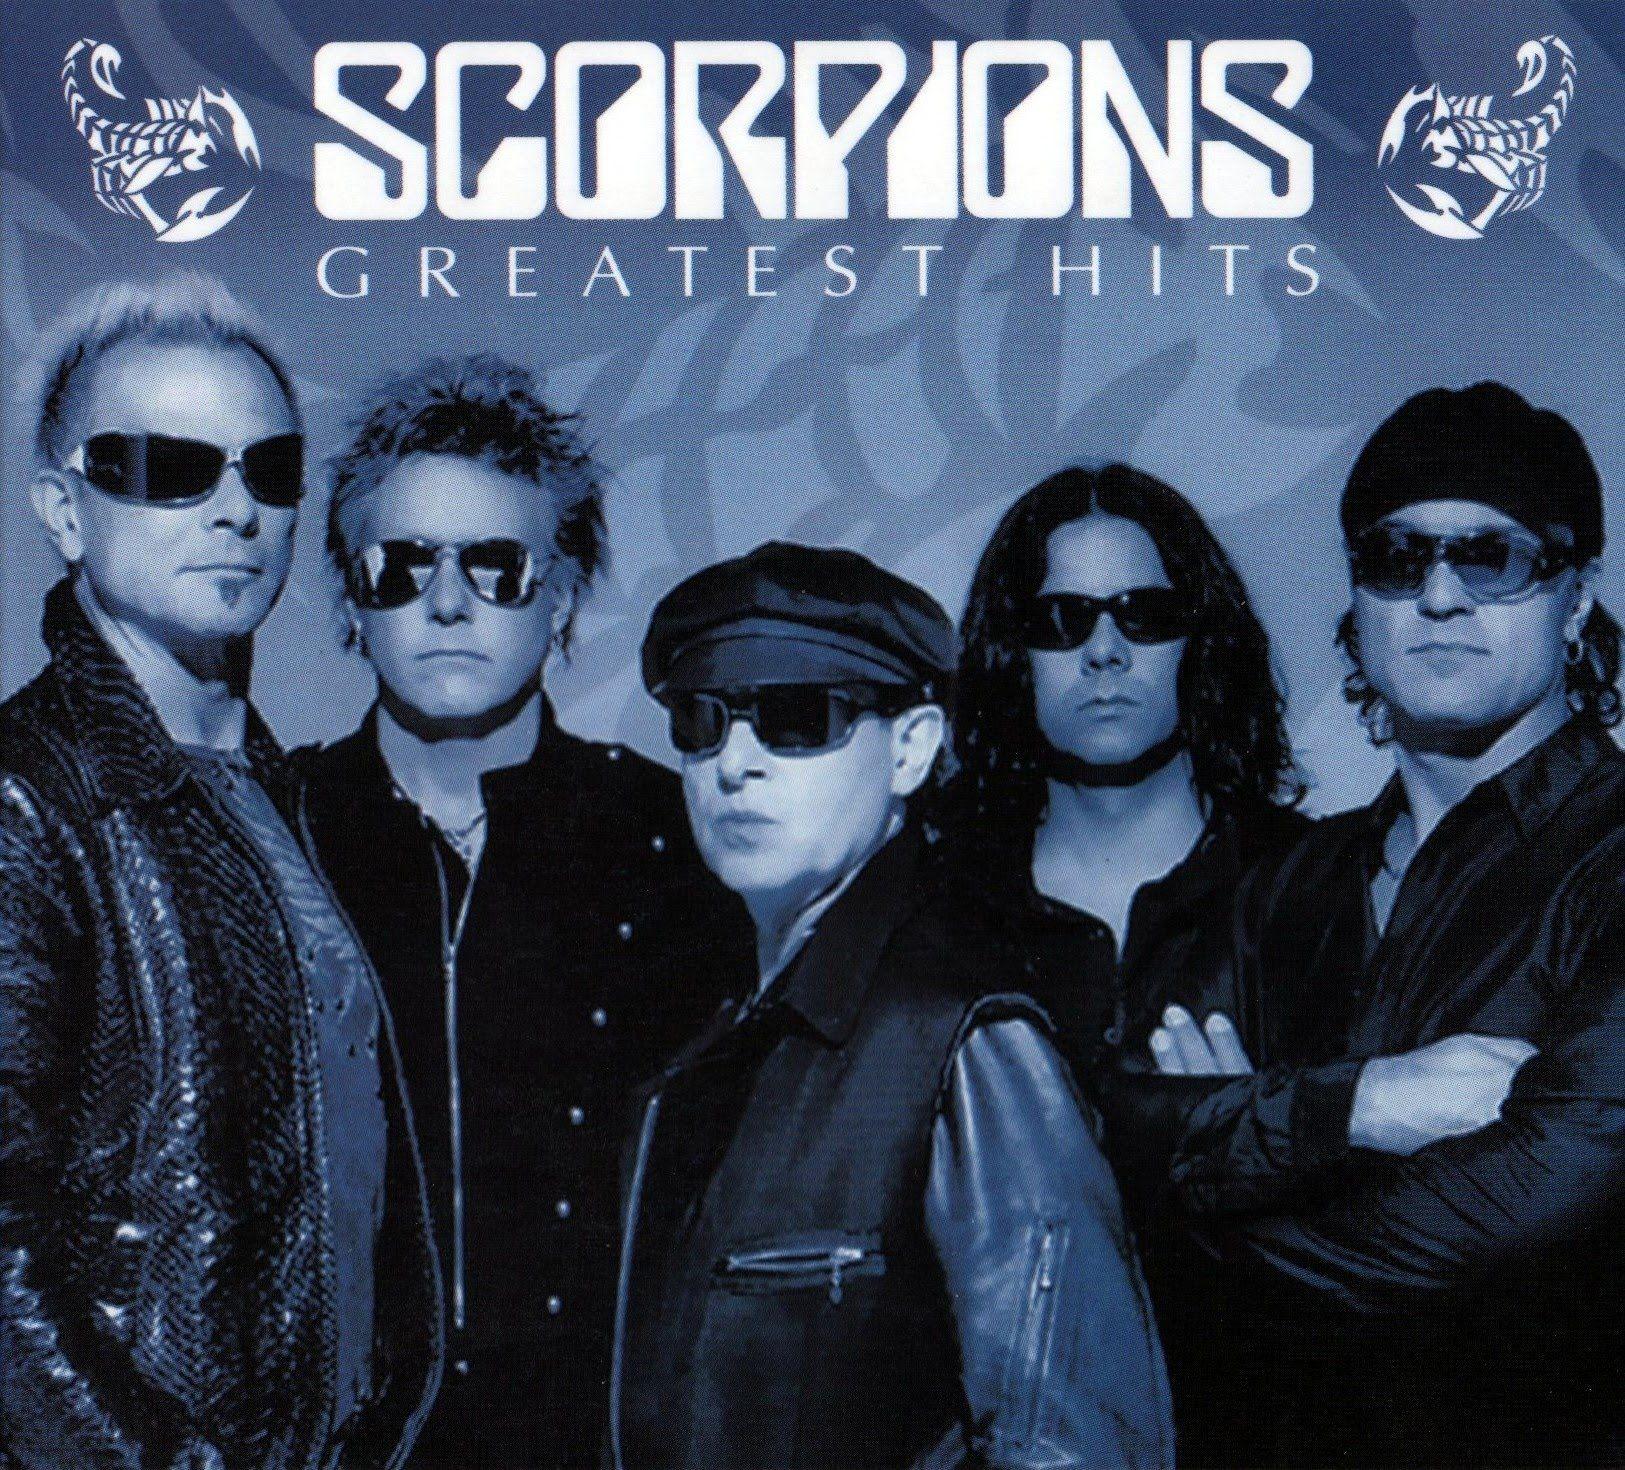 scorpions s greatest hits full album 80s music in 2019 musik. Black Bedroom Furniture Sets. Home Design Ideas